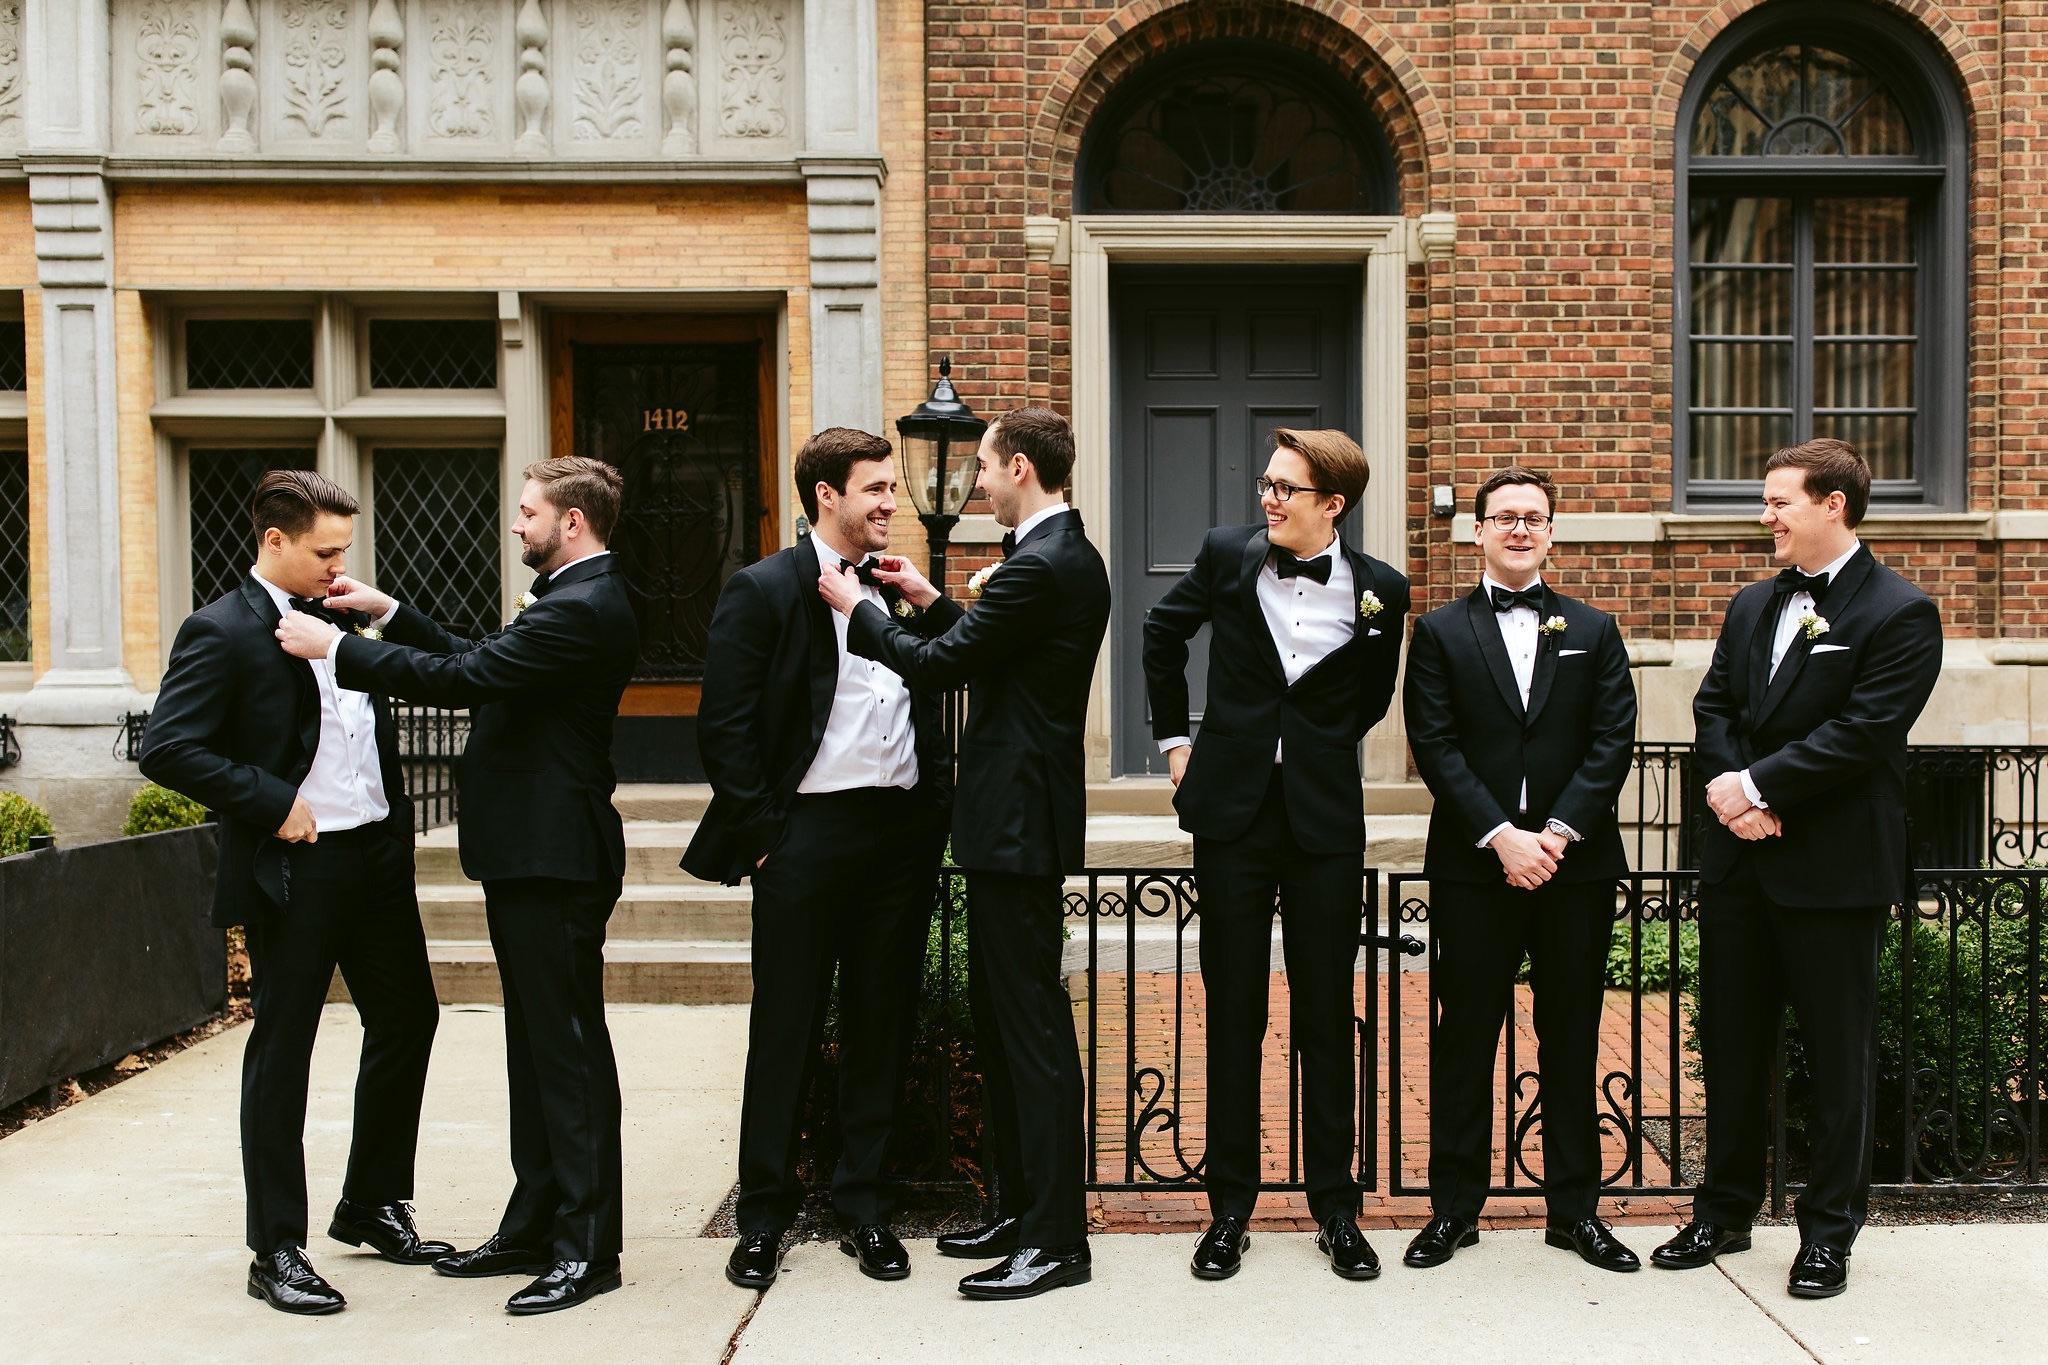 Nicodem-Creative-Wedding-Photography-Chicago-The-Ivy-Room-BHLDN-Suit-Supply-Jenny-Yoo-Steves-Flower-Market-Simply-Elegant-Group